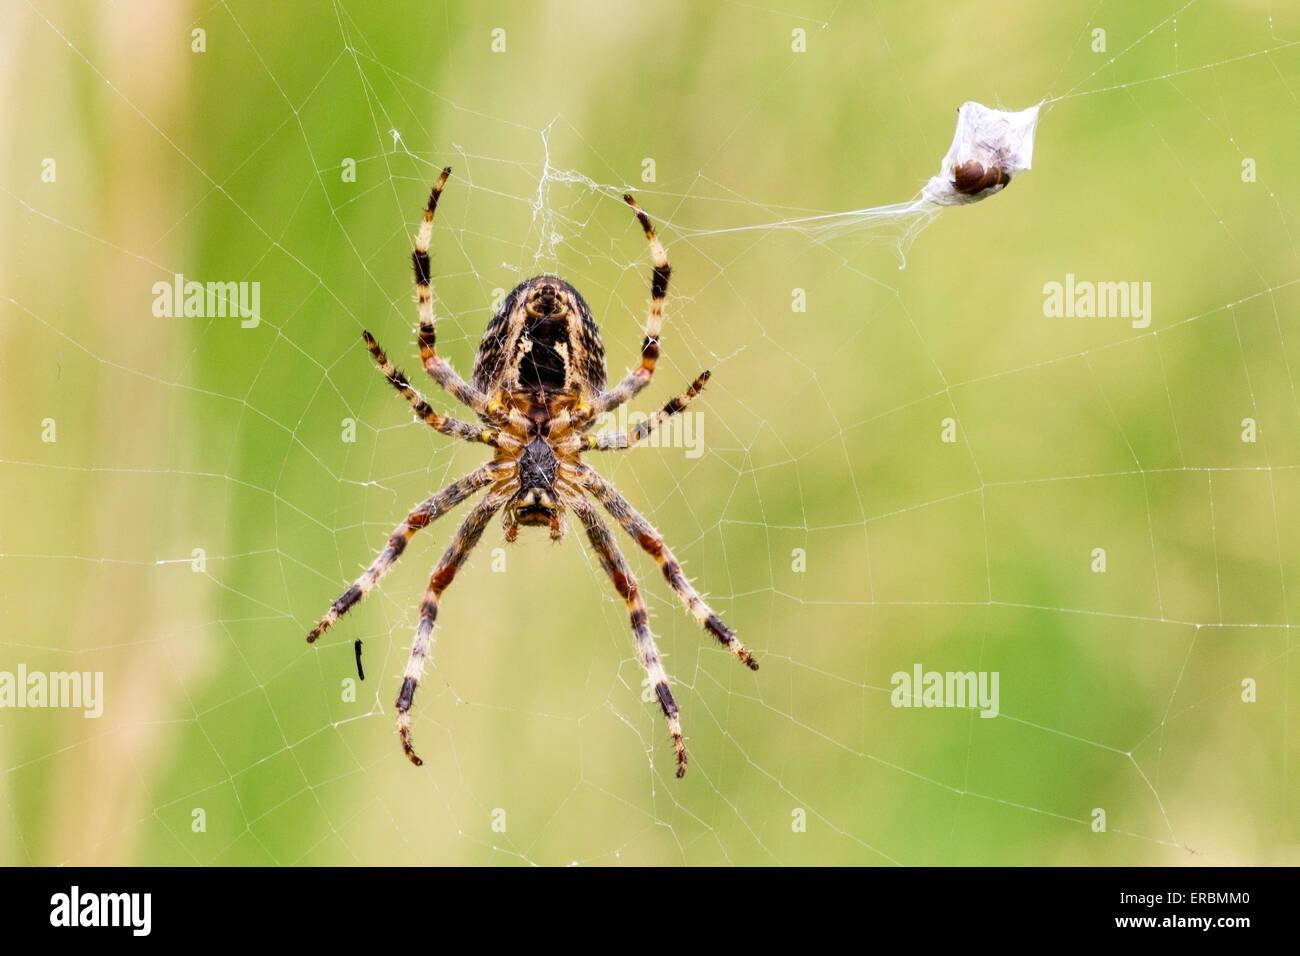 common garden spider araneus diadematus adult in web with prey norfolk england united kingdom - Common Garden Spider